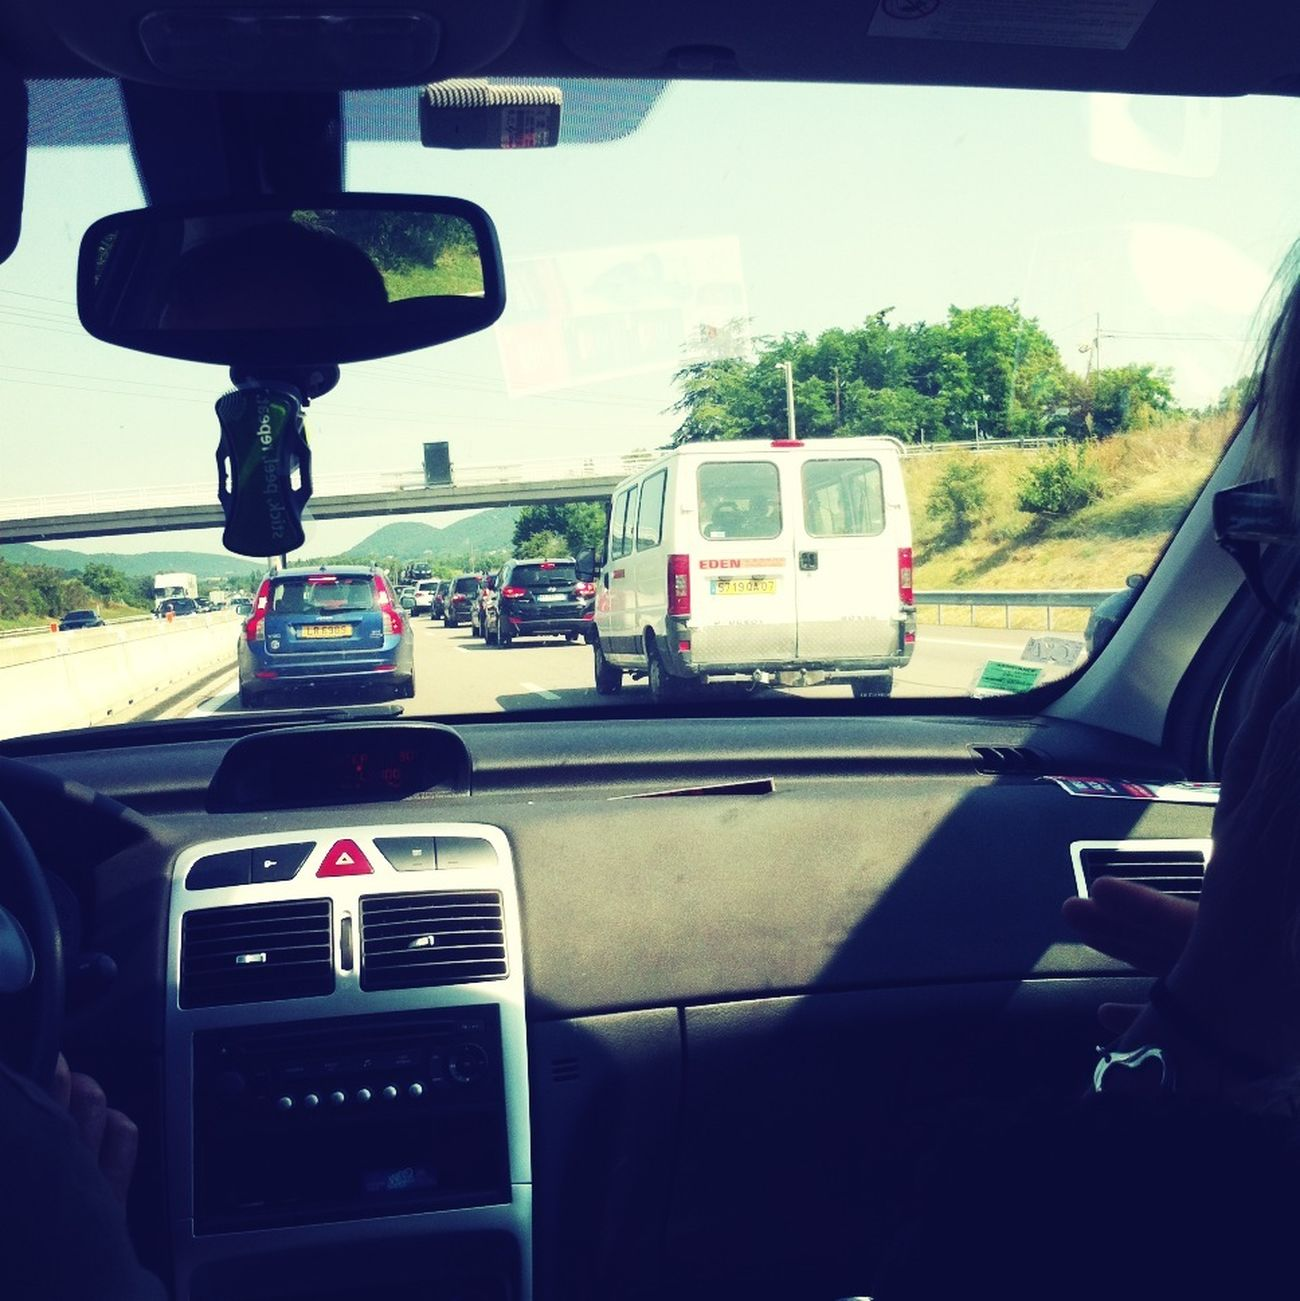 Traffic Signal In Traffic Travelling